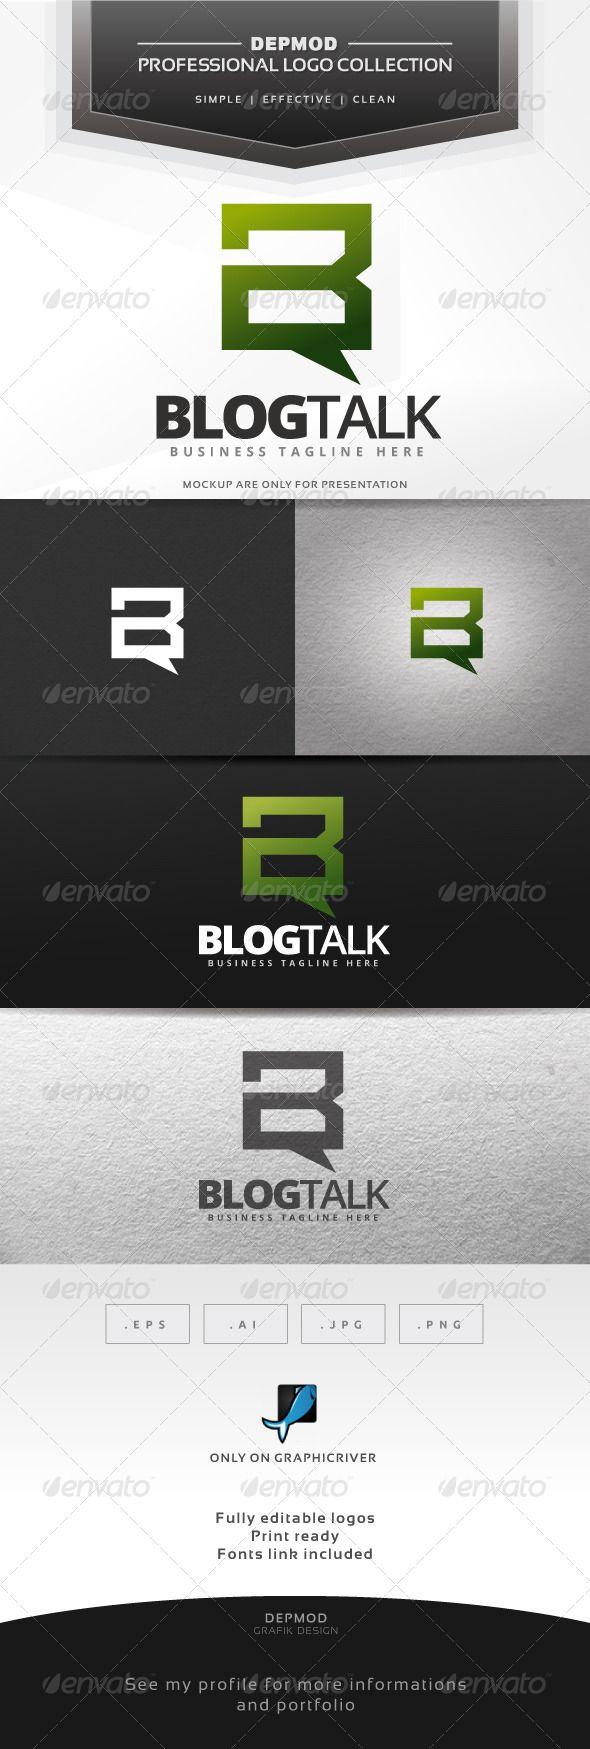 Template Formal Letter%0A Blog Talk Logo